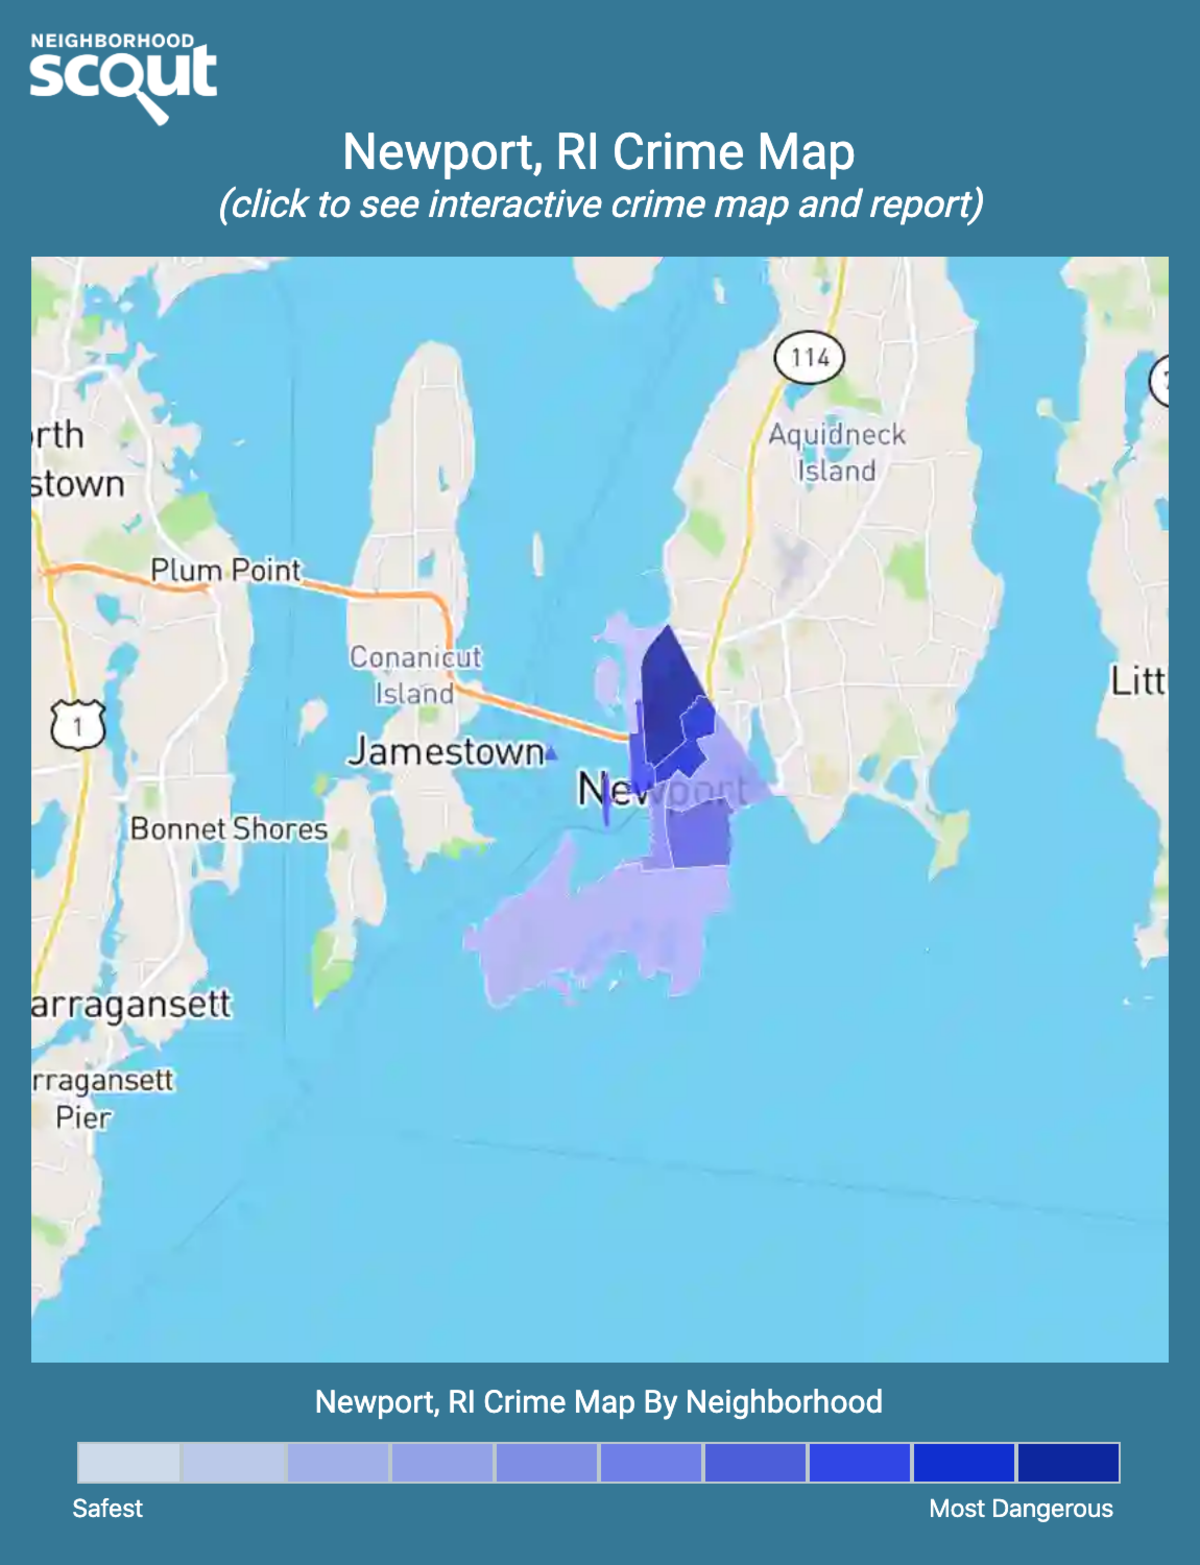 Newport, Rhode Island crime map